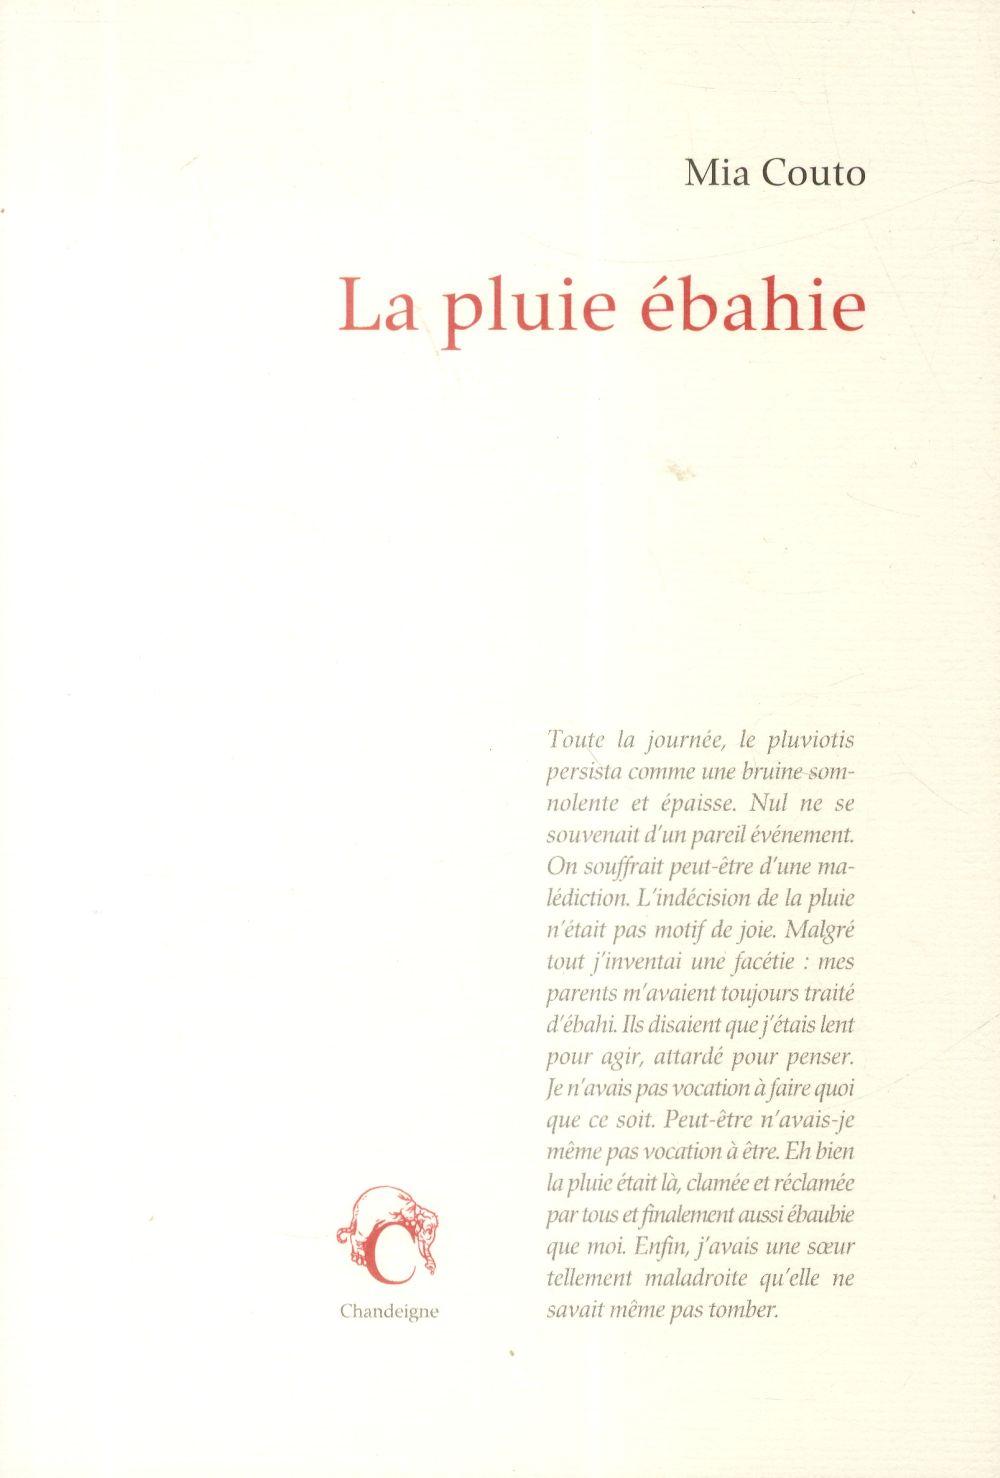 LA PLUIE EBAHIE